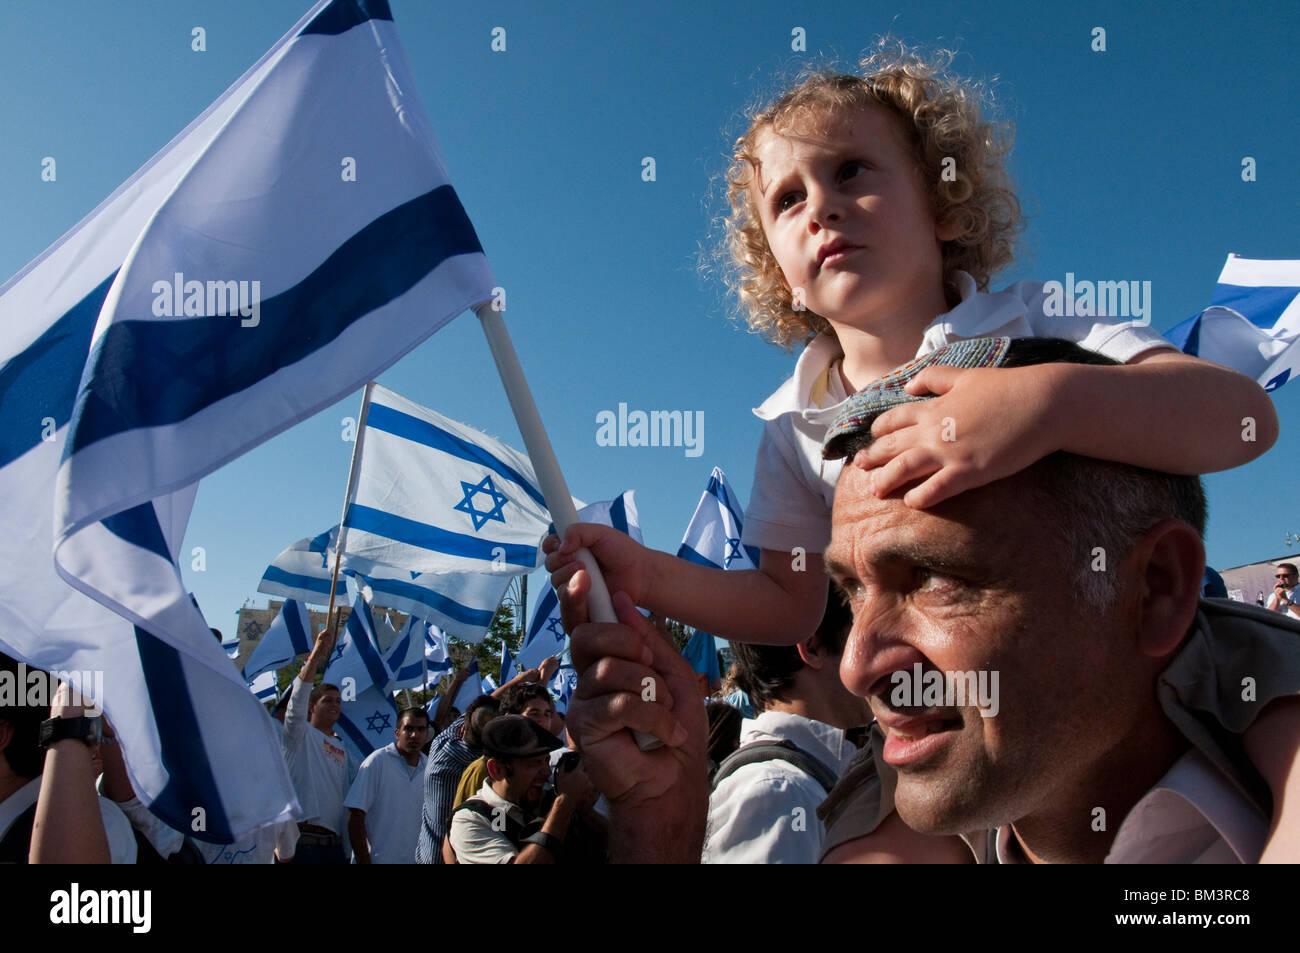 Israël. Jérusalem. La Journée de Jérusalem. La danse du pavillon Photo Stock